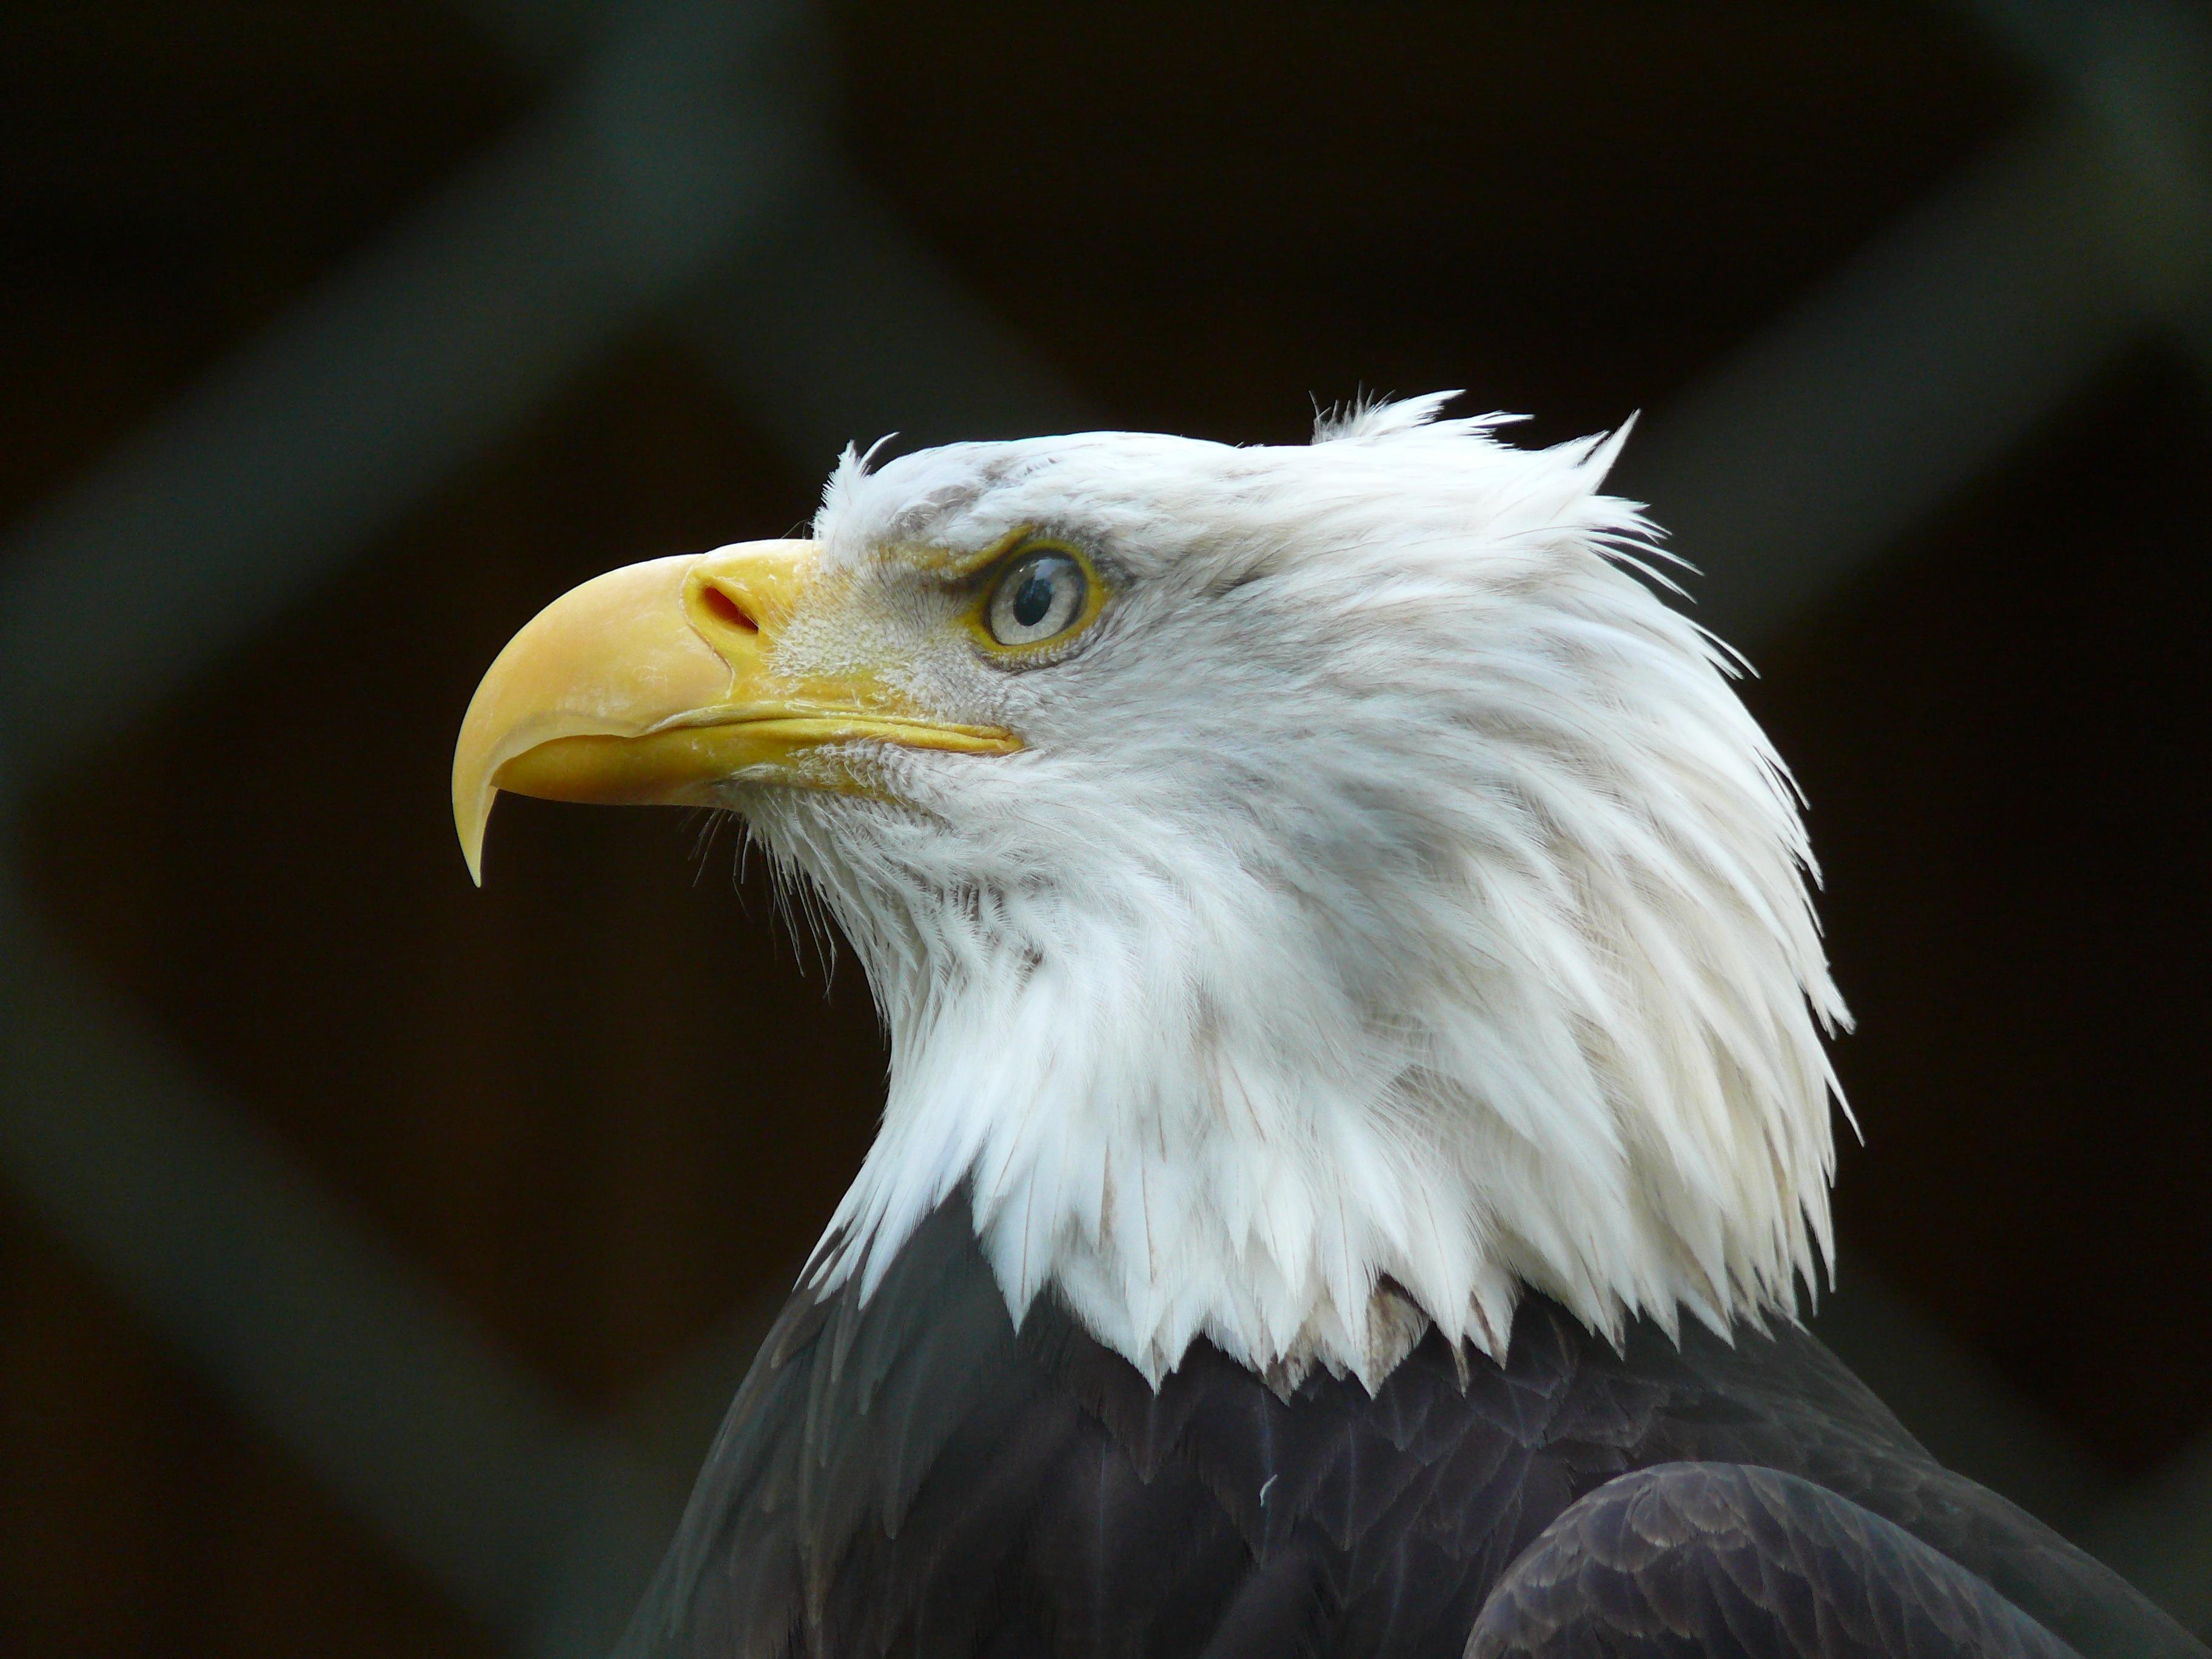 File:Bald-eagle P1010358.JPG - Wikimedia Commons